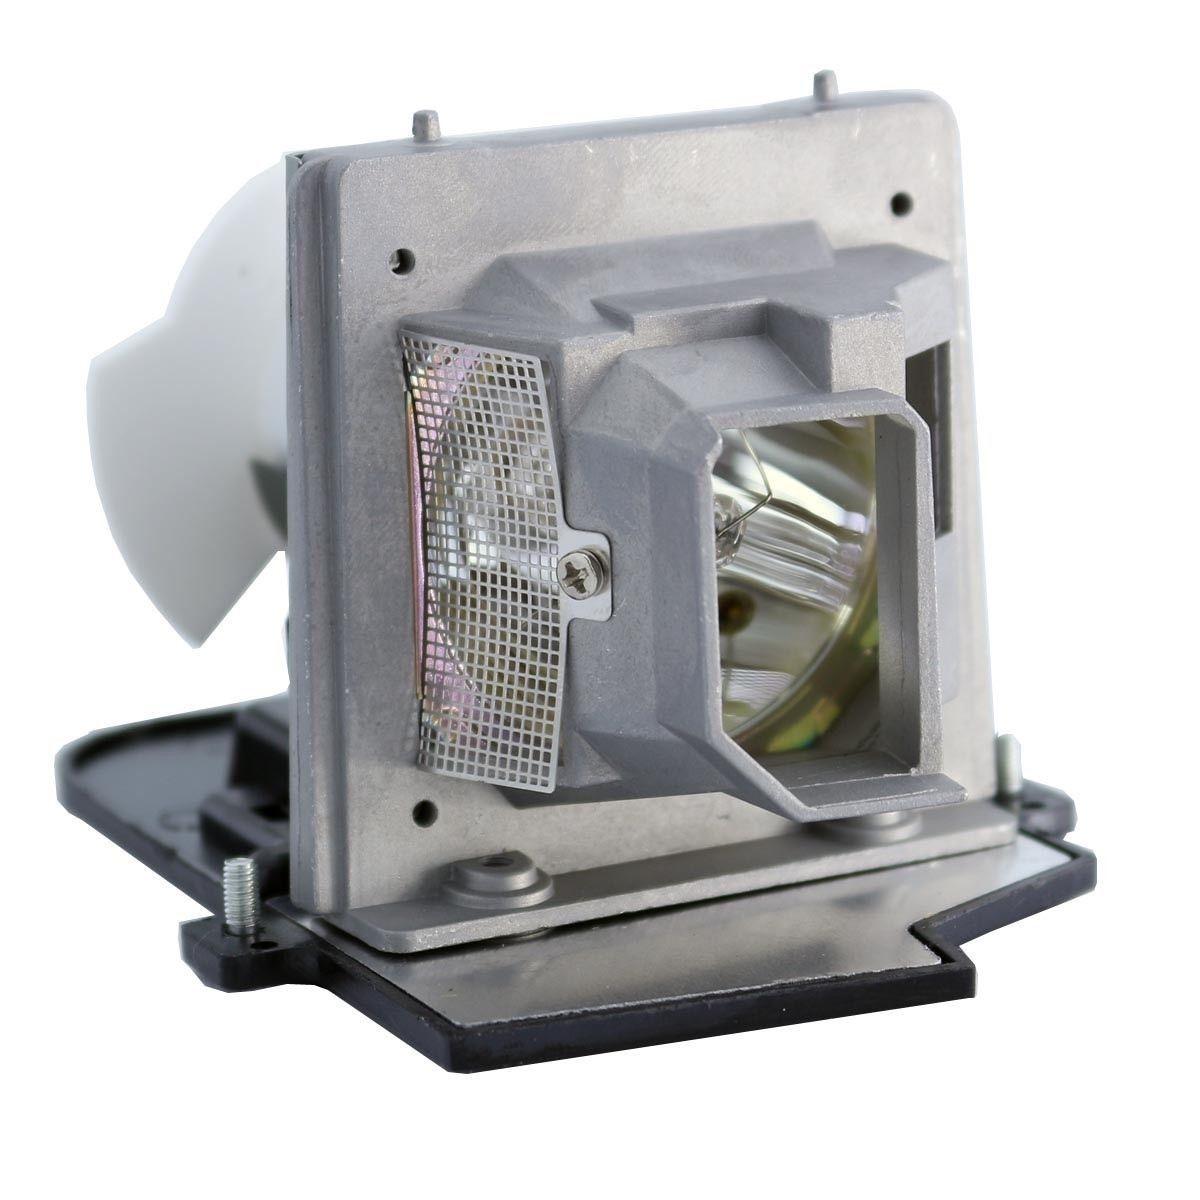 все цены на EC.J2101.001 for ACER XD1250P XD1270D PD100S PD100D PD100P PD100PD PD120 PD120D PD120P PD120PD XD1170D Projector Bulb Lamp онлайн